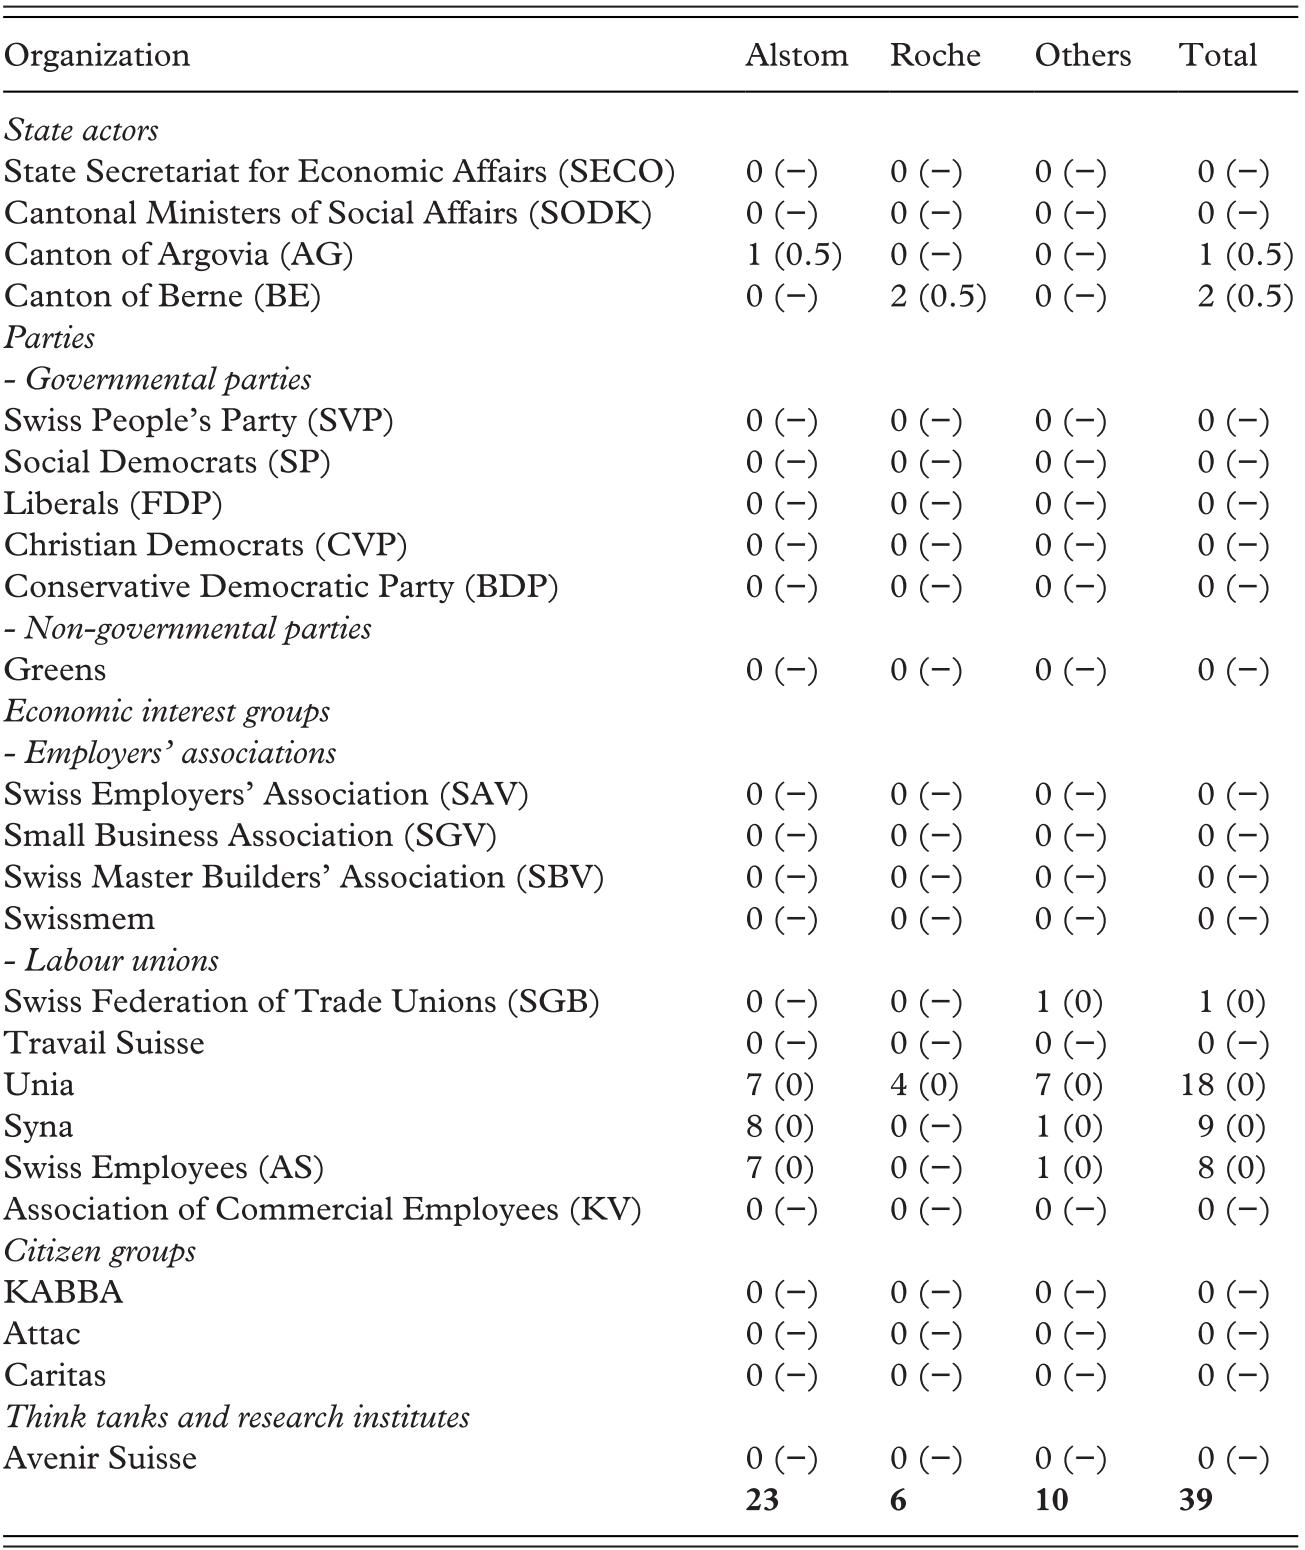 Communicating in Public (Part III) - Debating Unemployment